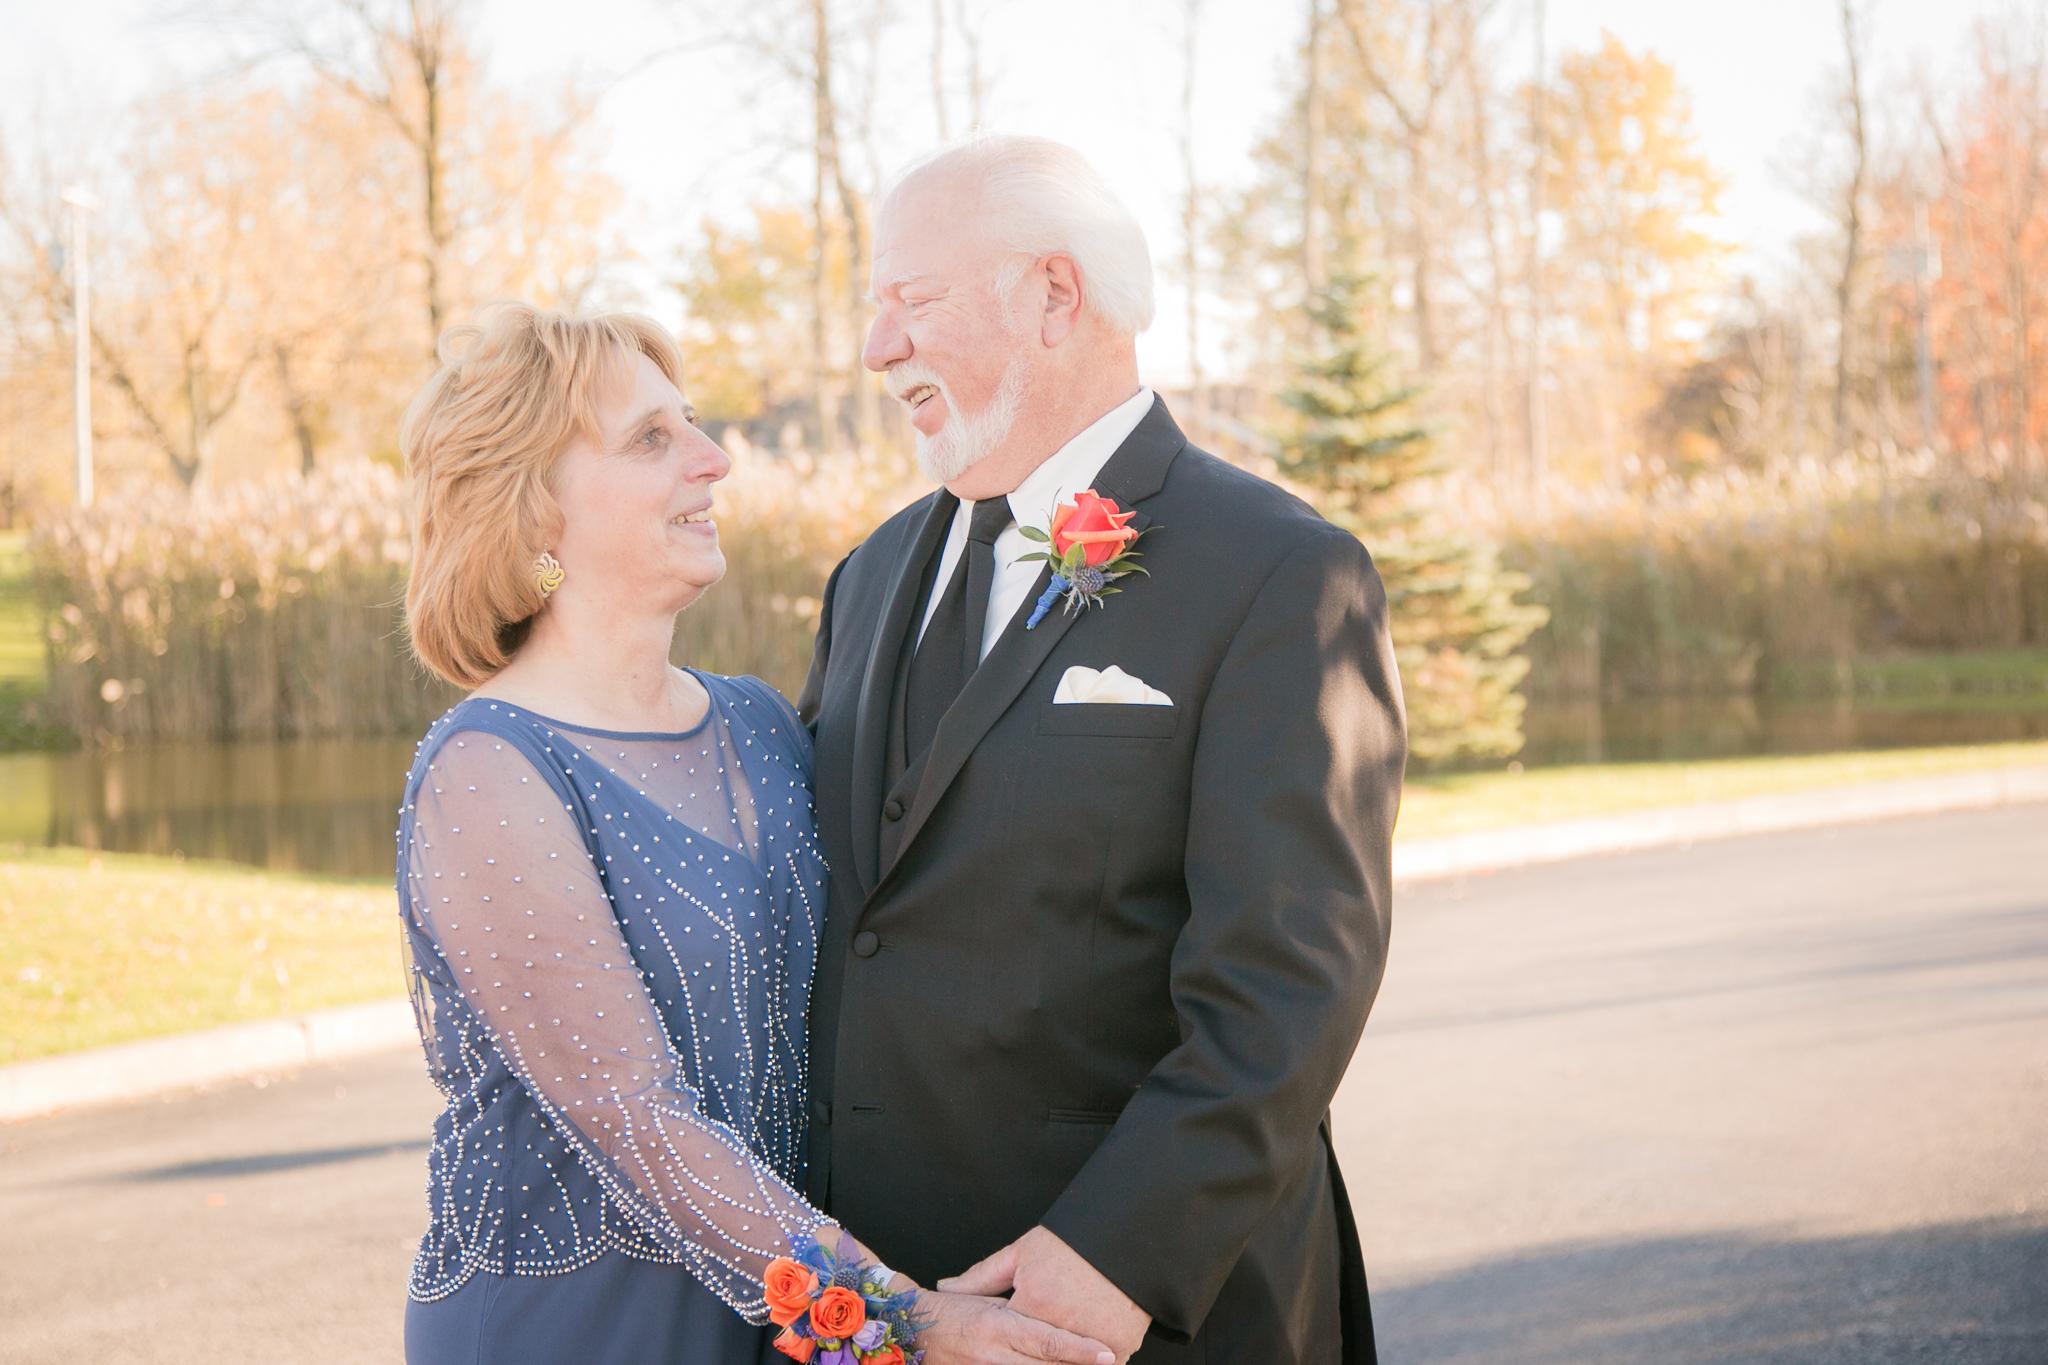 camuglia-whomstudio-chelsea_and_andy-nycphotographer-wedding-brooklyn-buffalo-timberlodge-030-5334.jpg